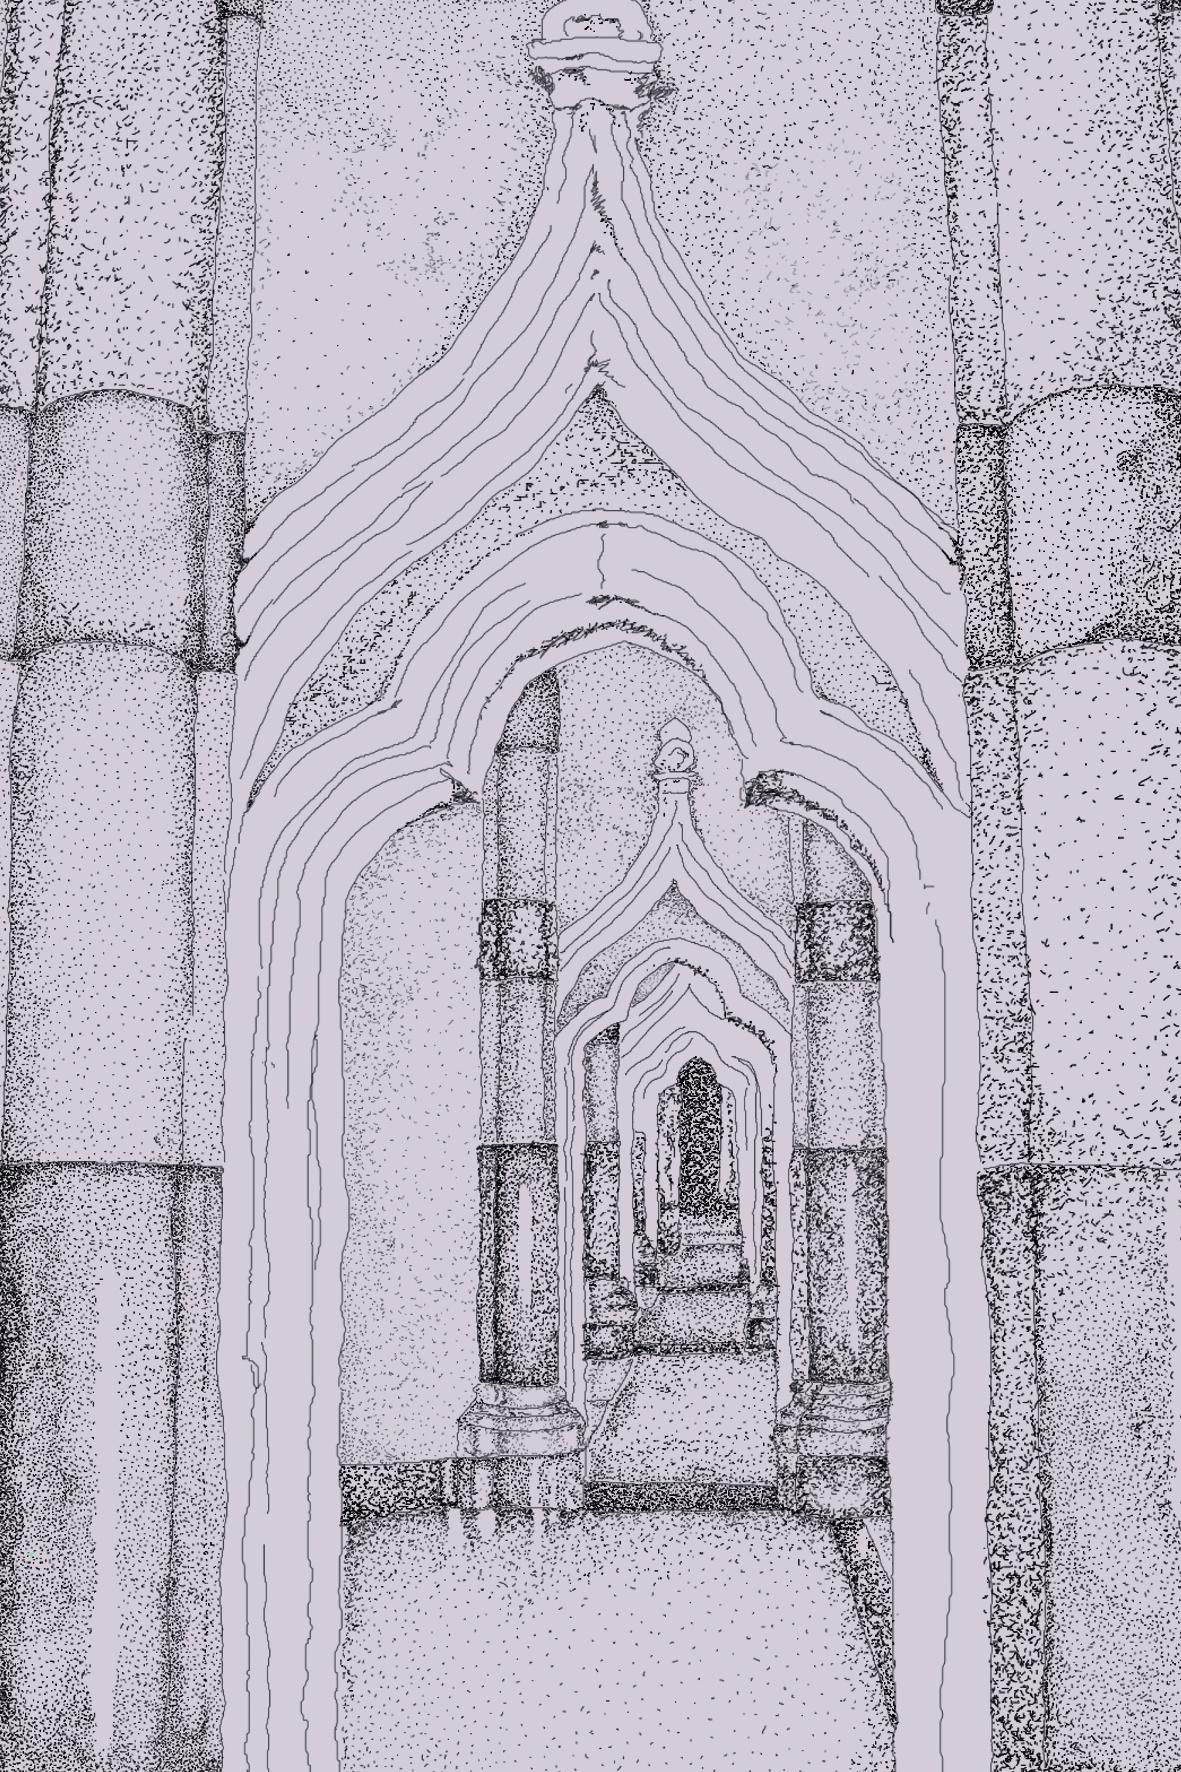 iglesia adentro 10x15 copia.jpg